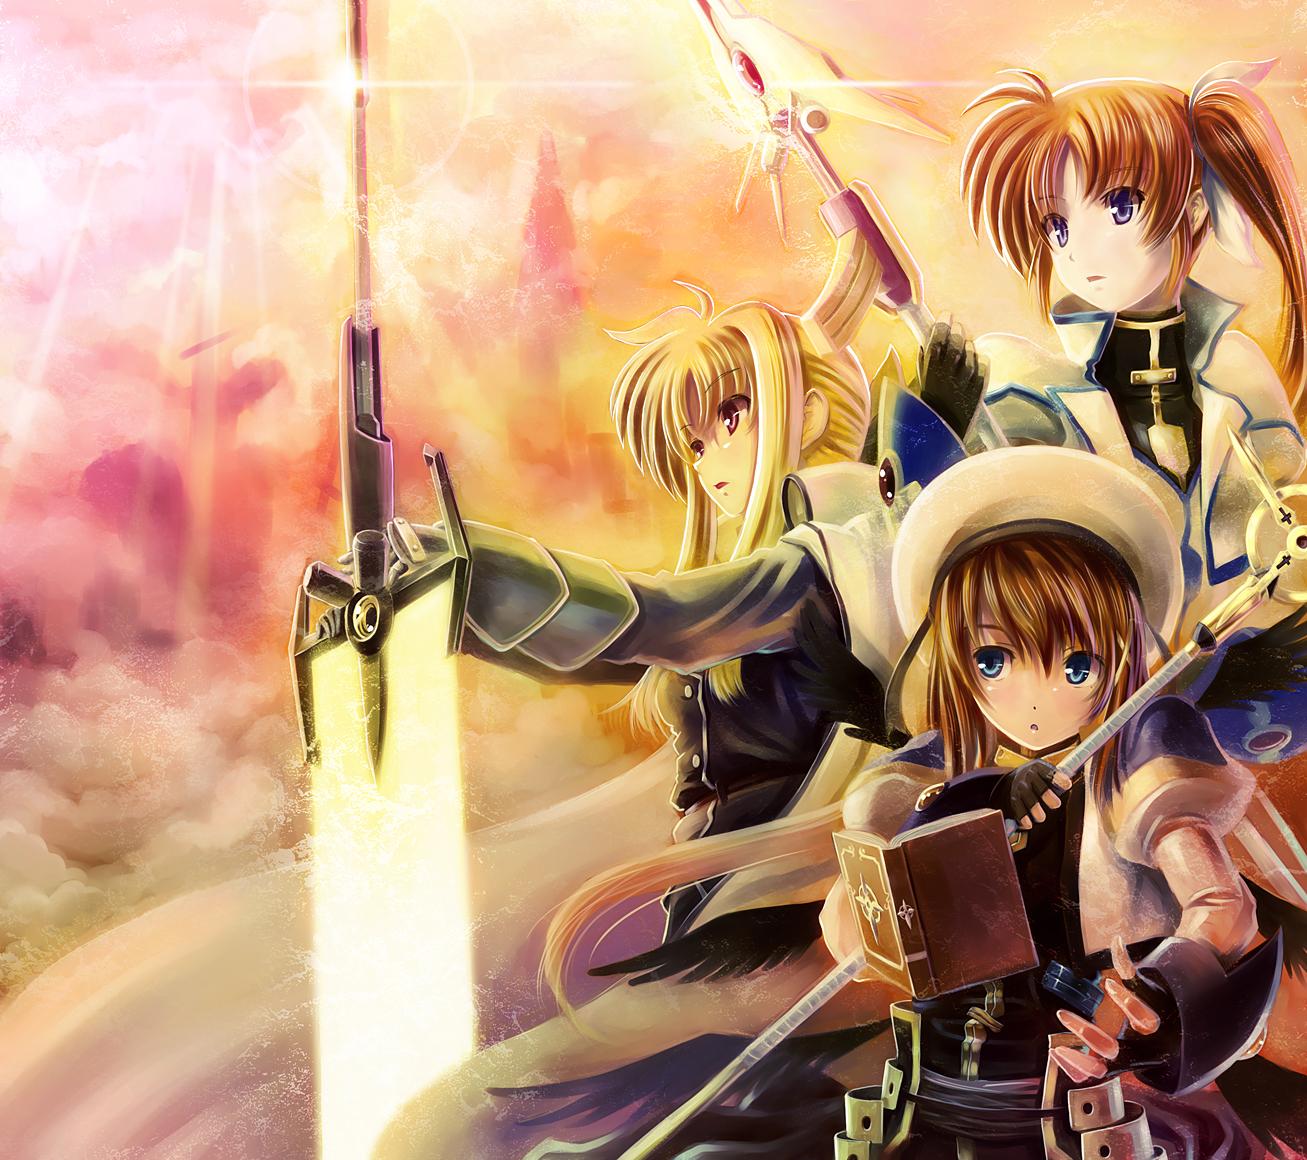 book fate_testarossa mahou_shoujo_lyrical_nanoha mahou_shoujo_lyrical_nanoha_strikers spear sword takamachi_nanoha weapon yagami_hayate